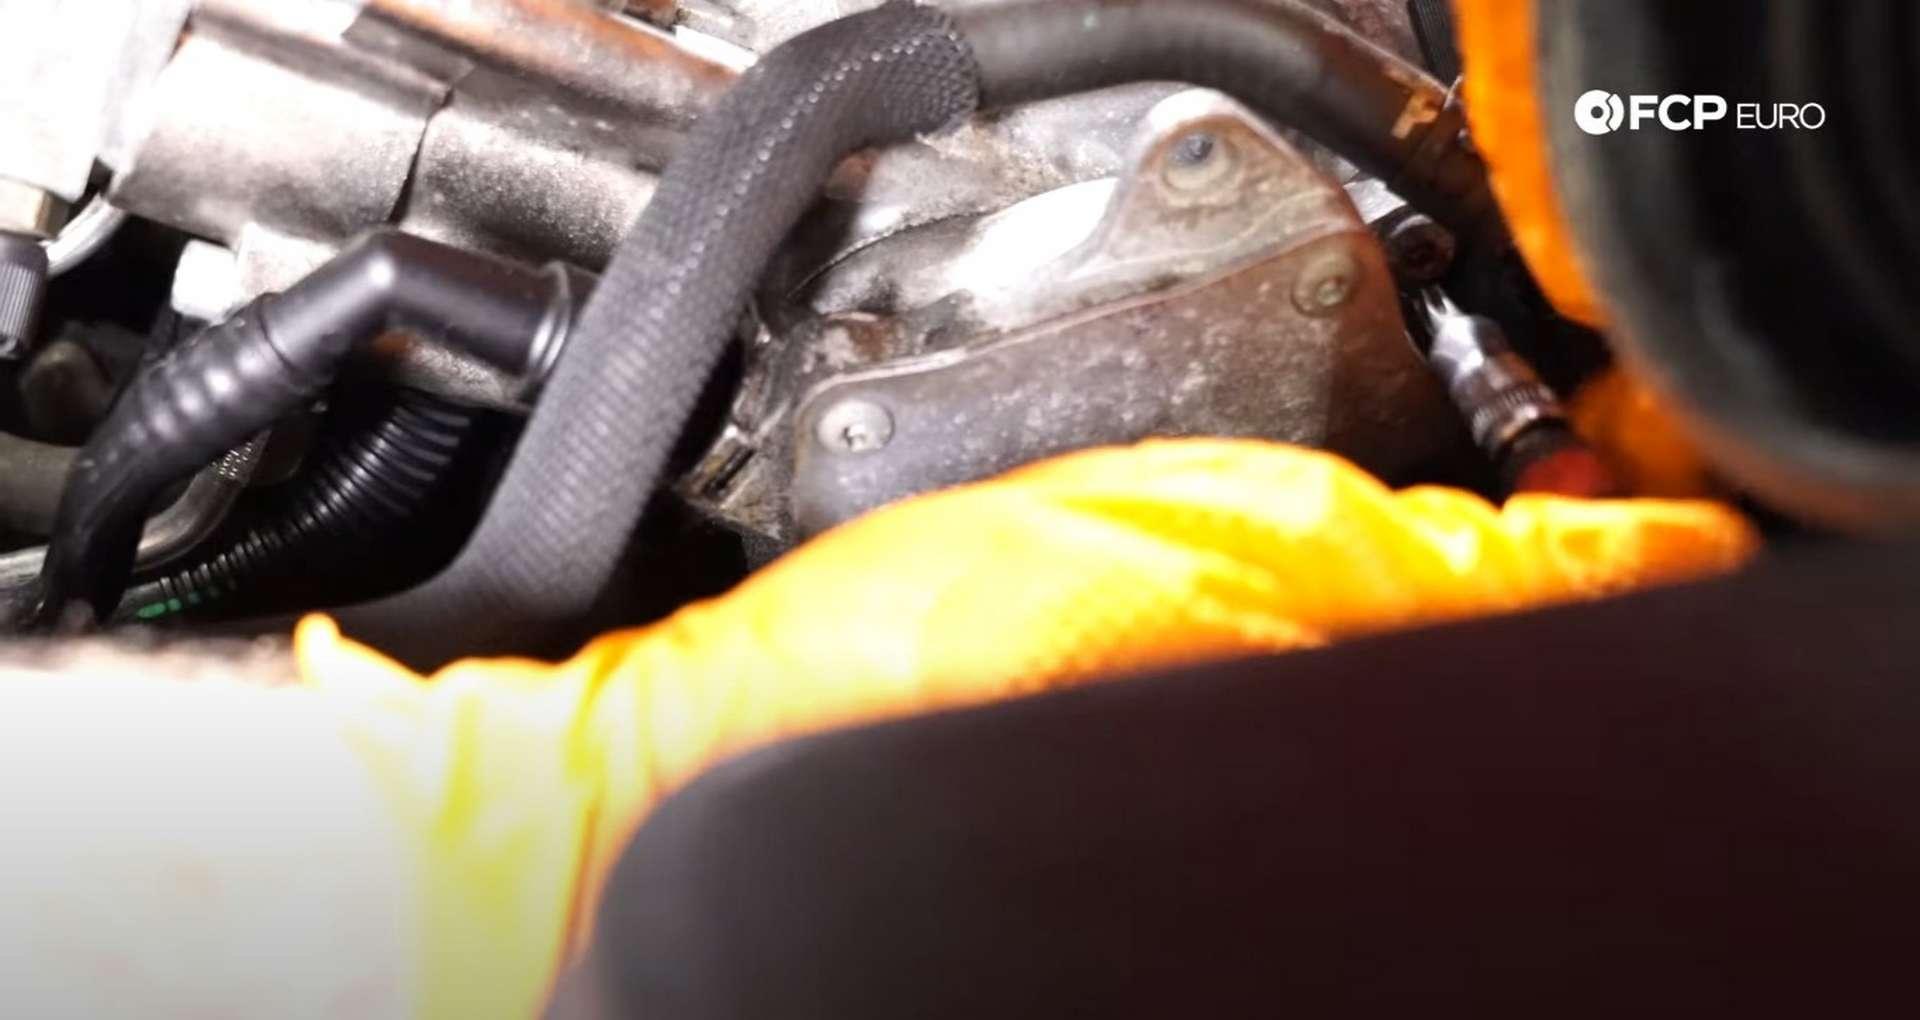 DIY VW GTI MK.5 Vacuum Pump Replacement T30 fastener location